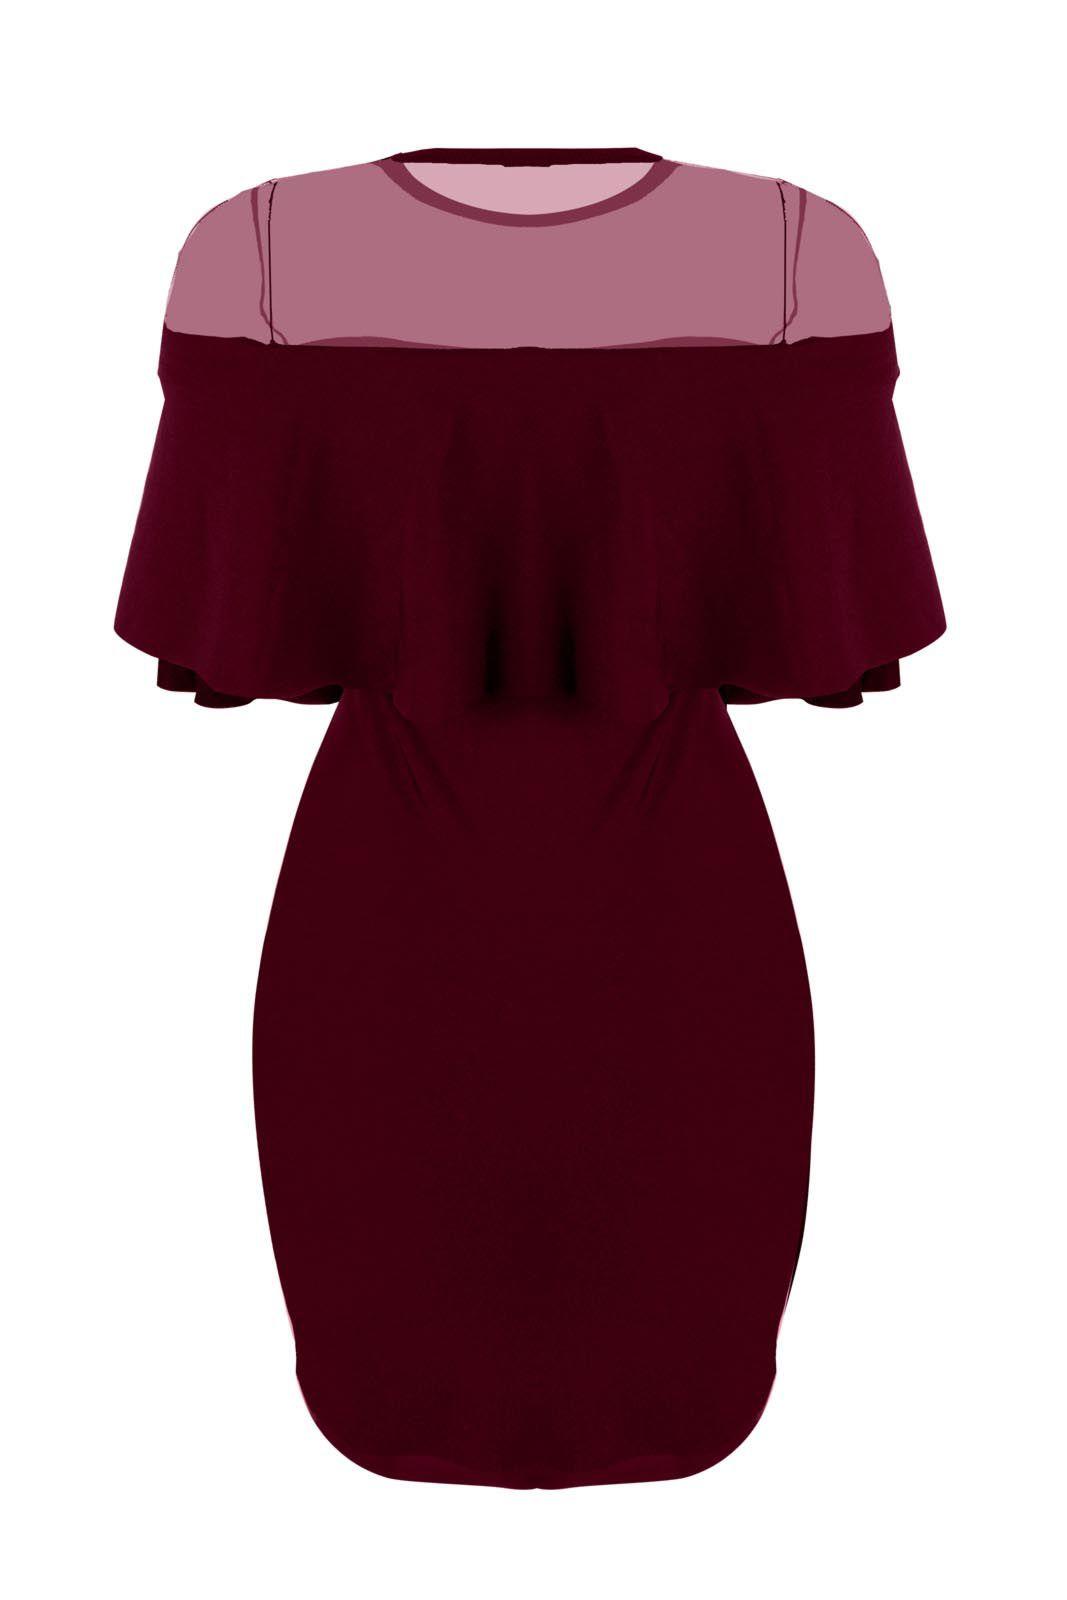 Vestido Outlet Dri Curto Cigana Manga Curta Suplex Decote Tule Fechado Rosa